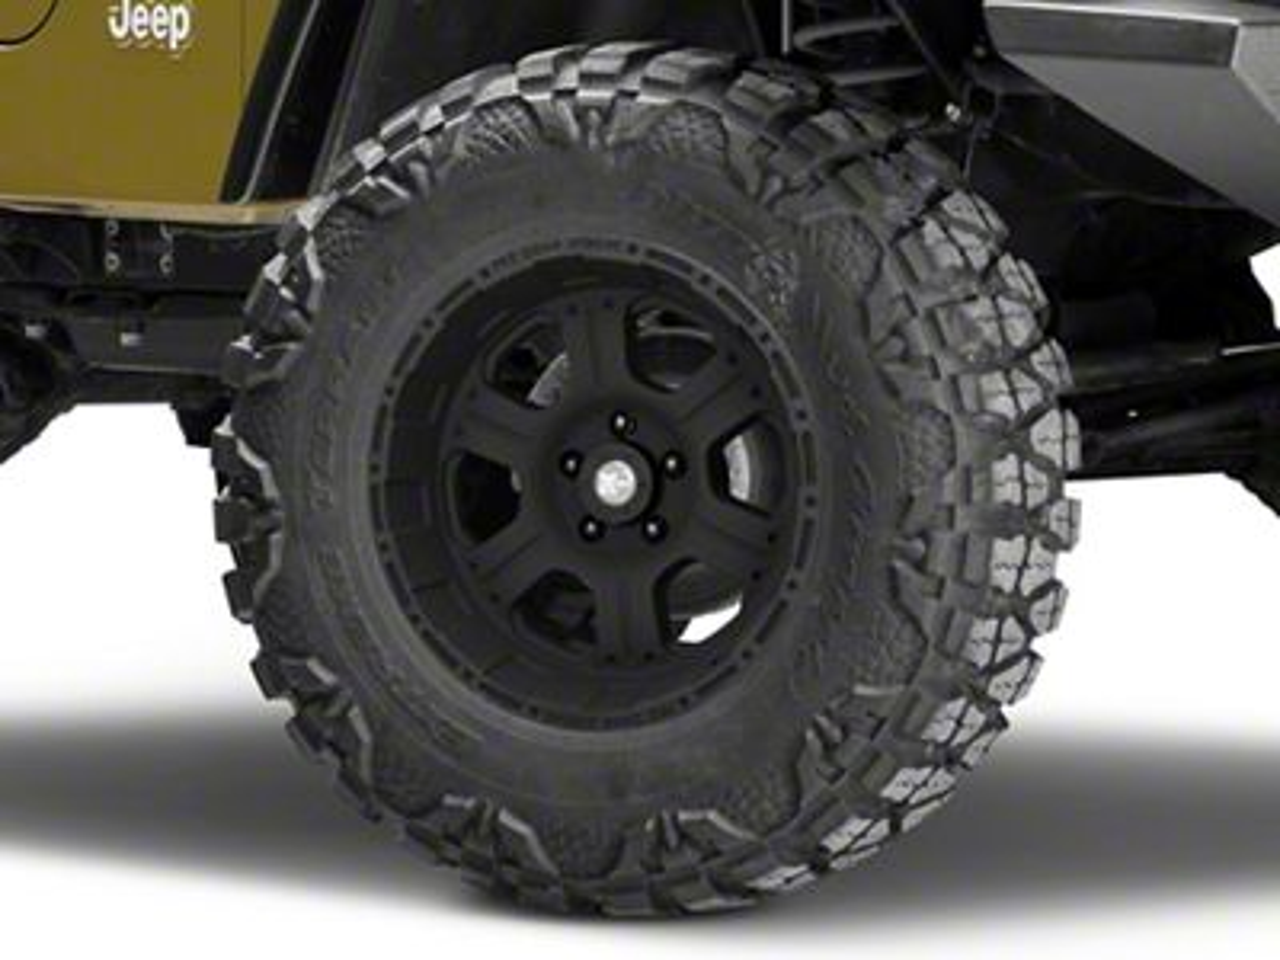 Pro Comp Series 7089 Flat Black Wheel - 17x9 (87-06 Jeep Wrangler YJ & TJ)